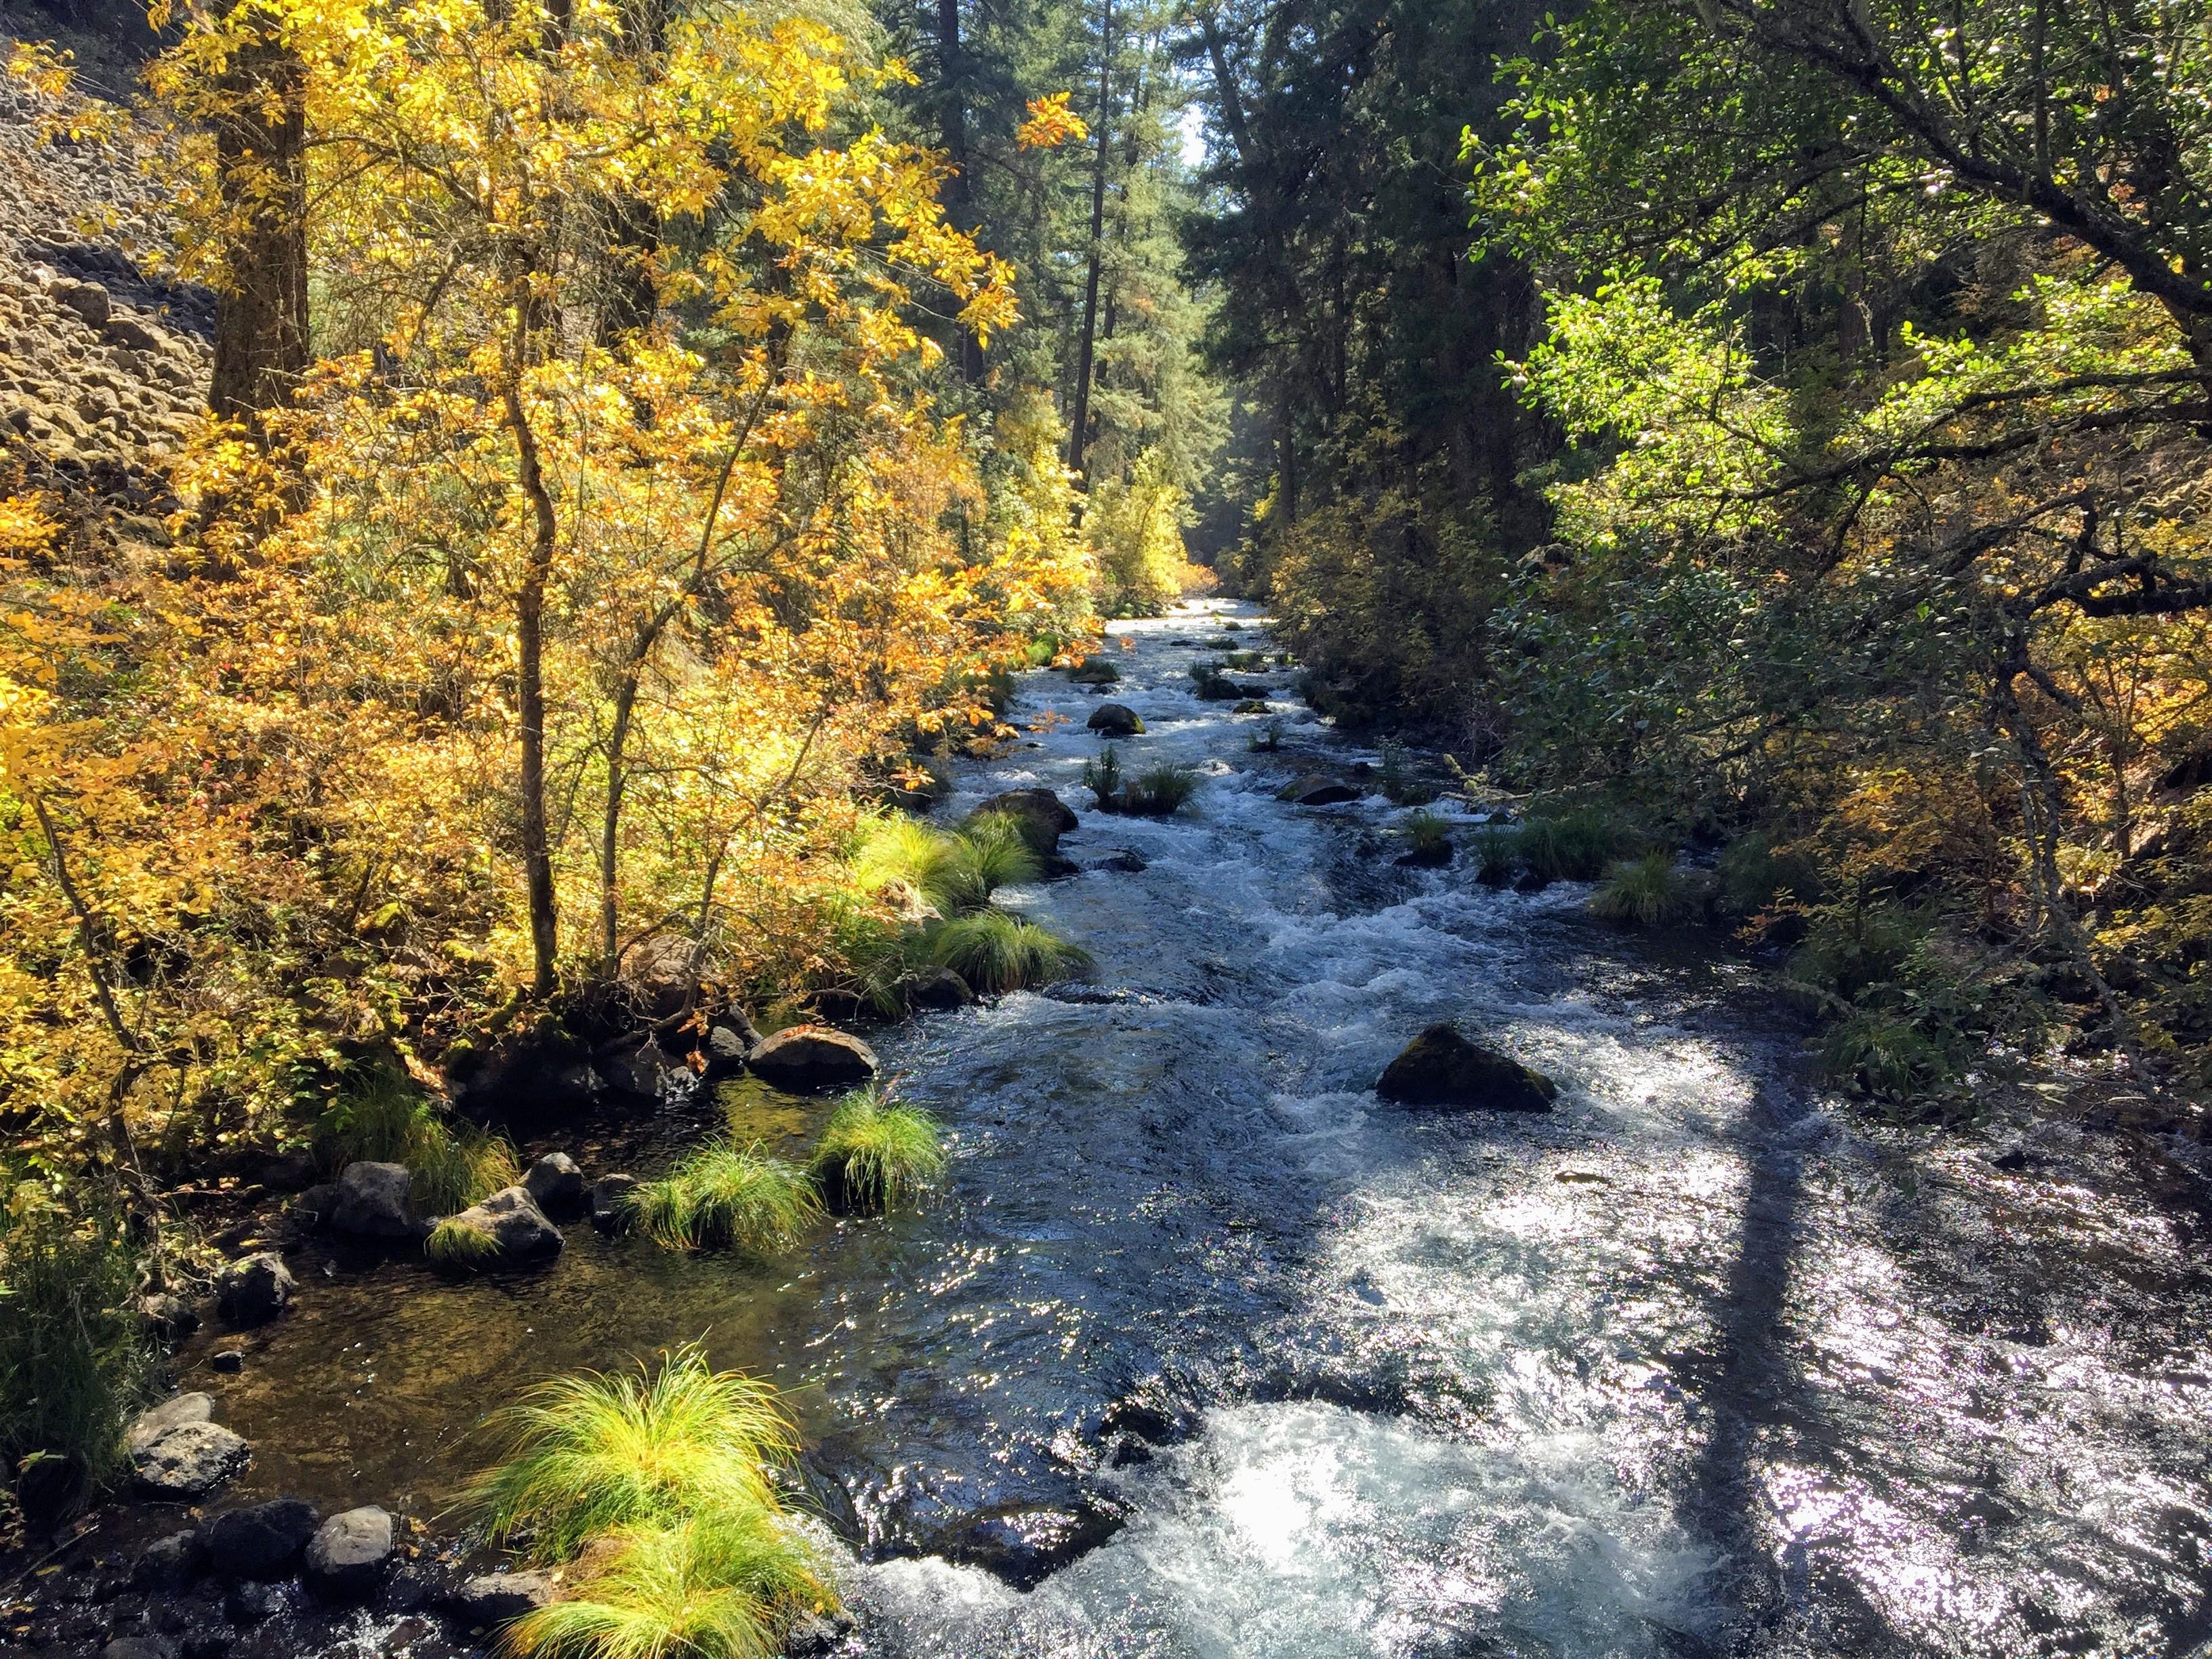 2017-10-05 California 02 Burney Falls 07